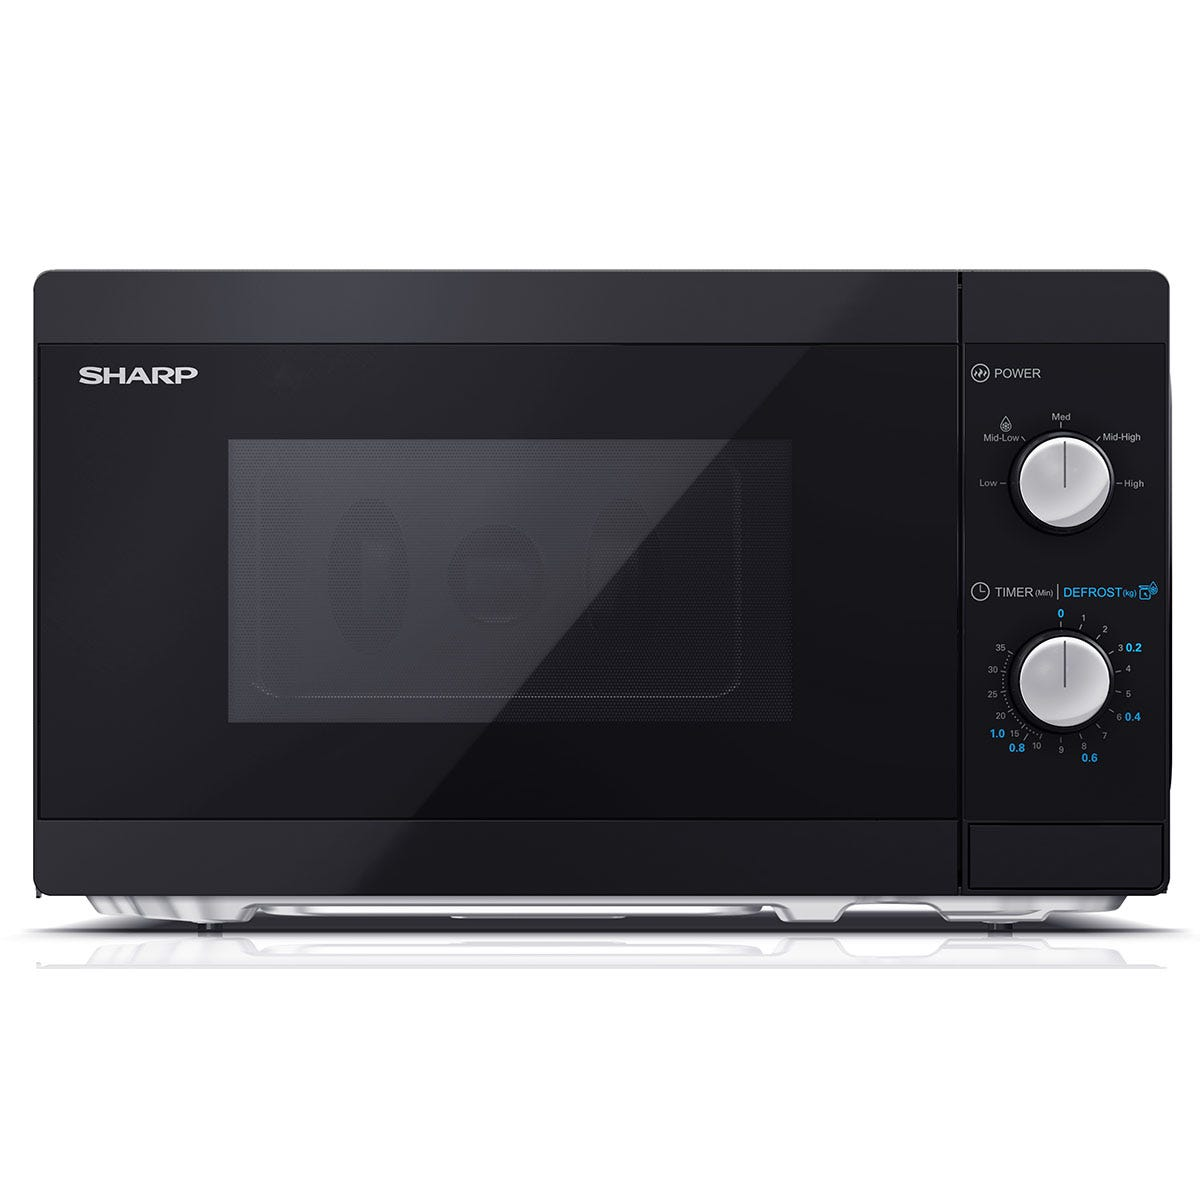 Sharp YC-MS01U-B 800W Solo Manual 20L Microwave - Black